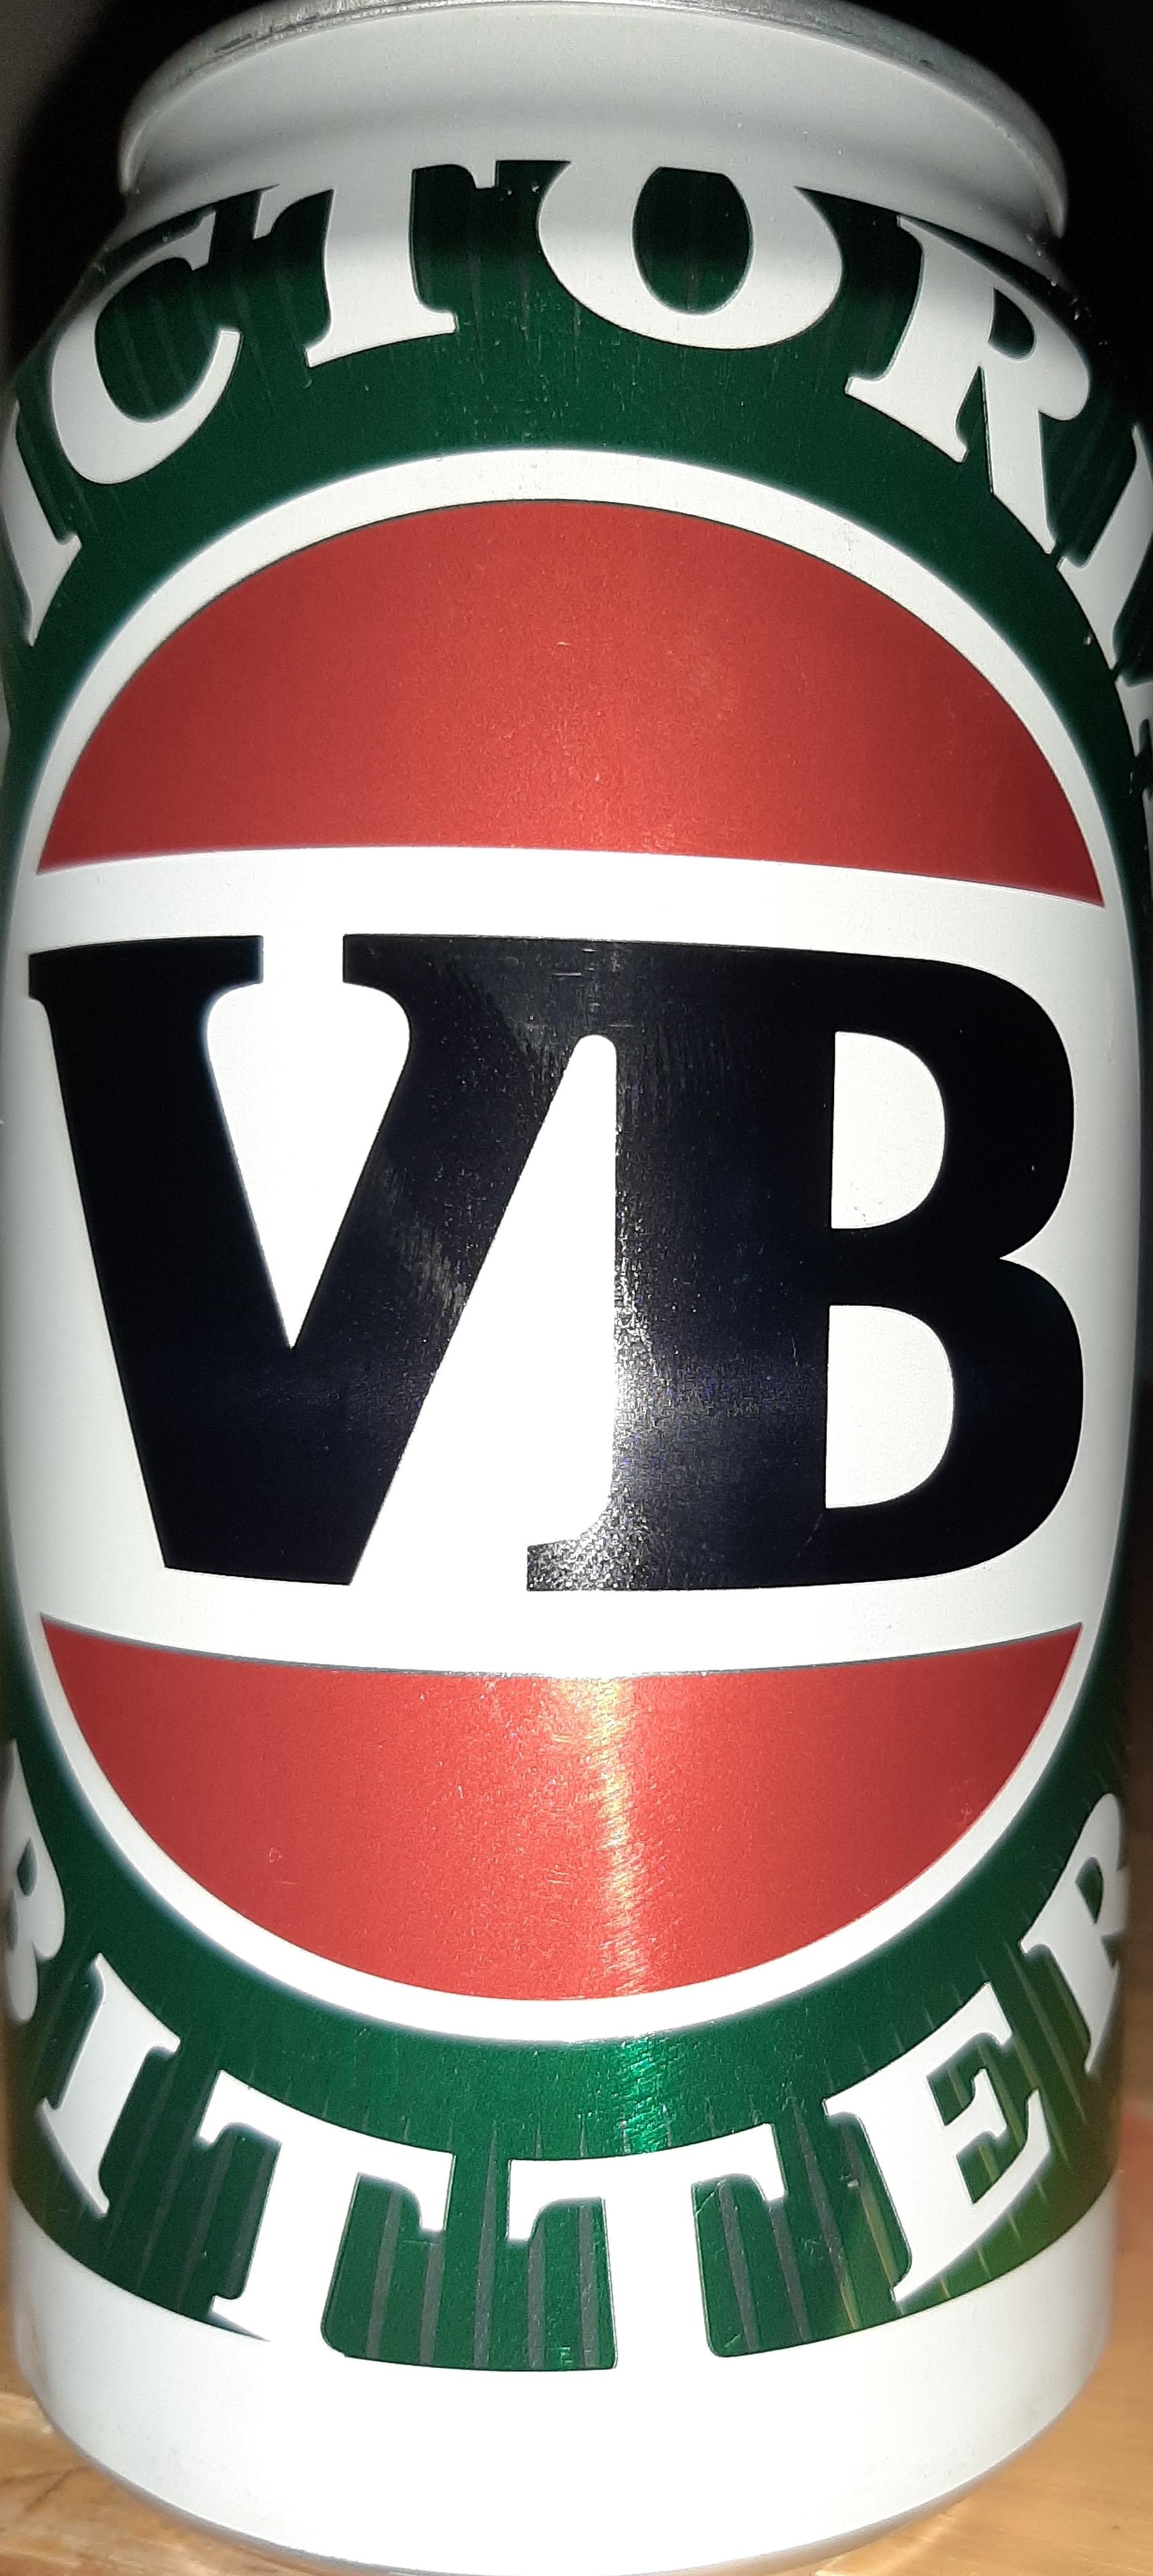 Victoria Bitter - Wikipedia